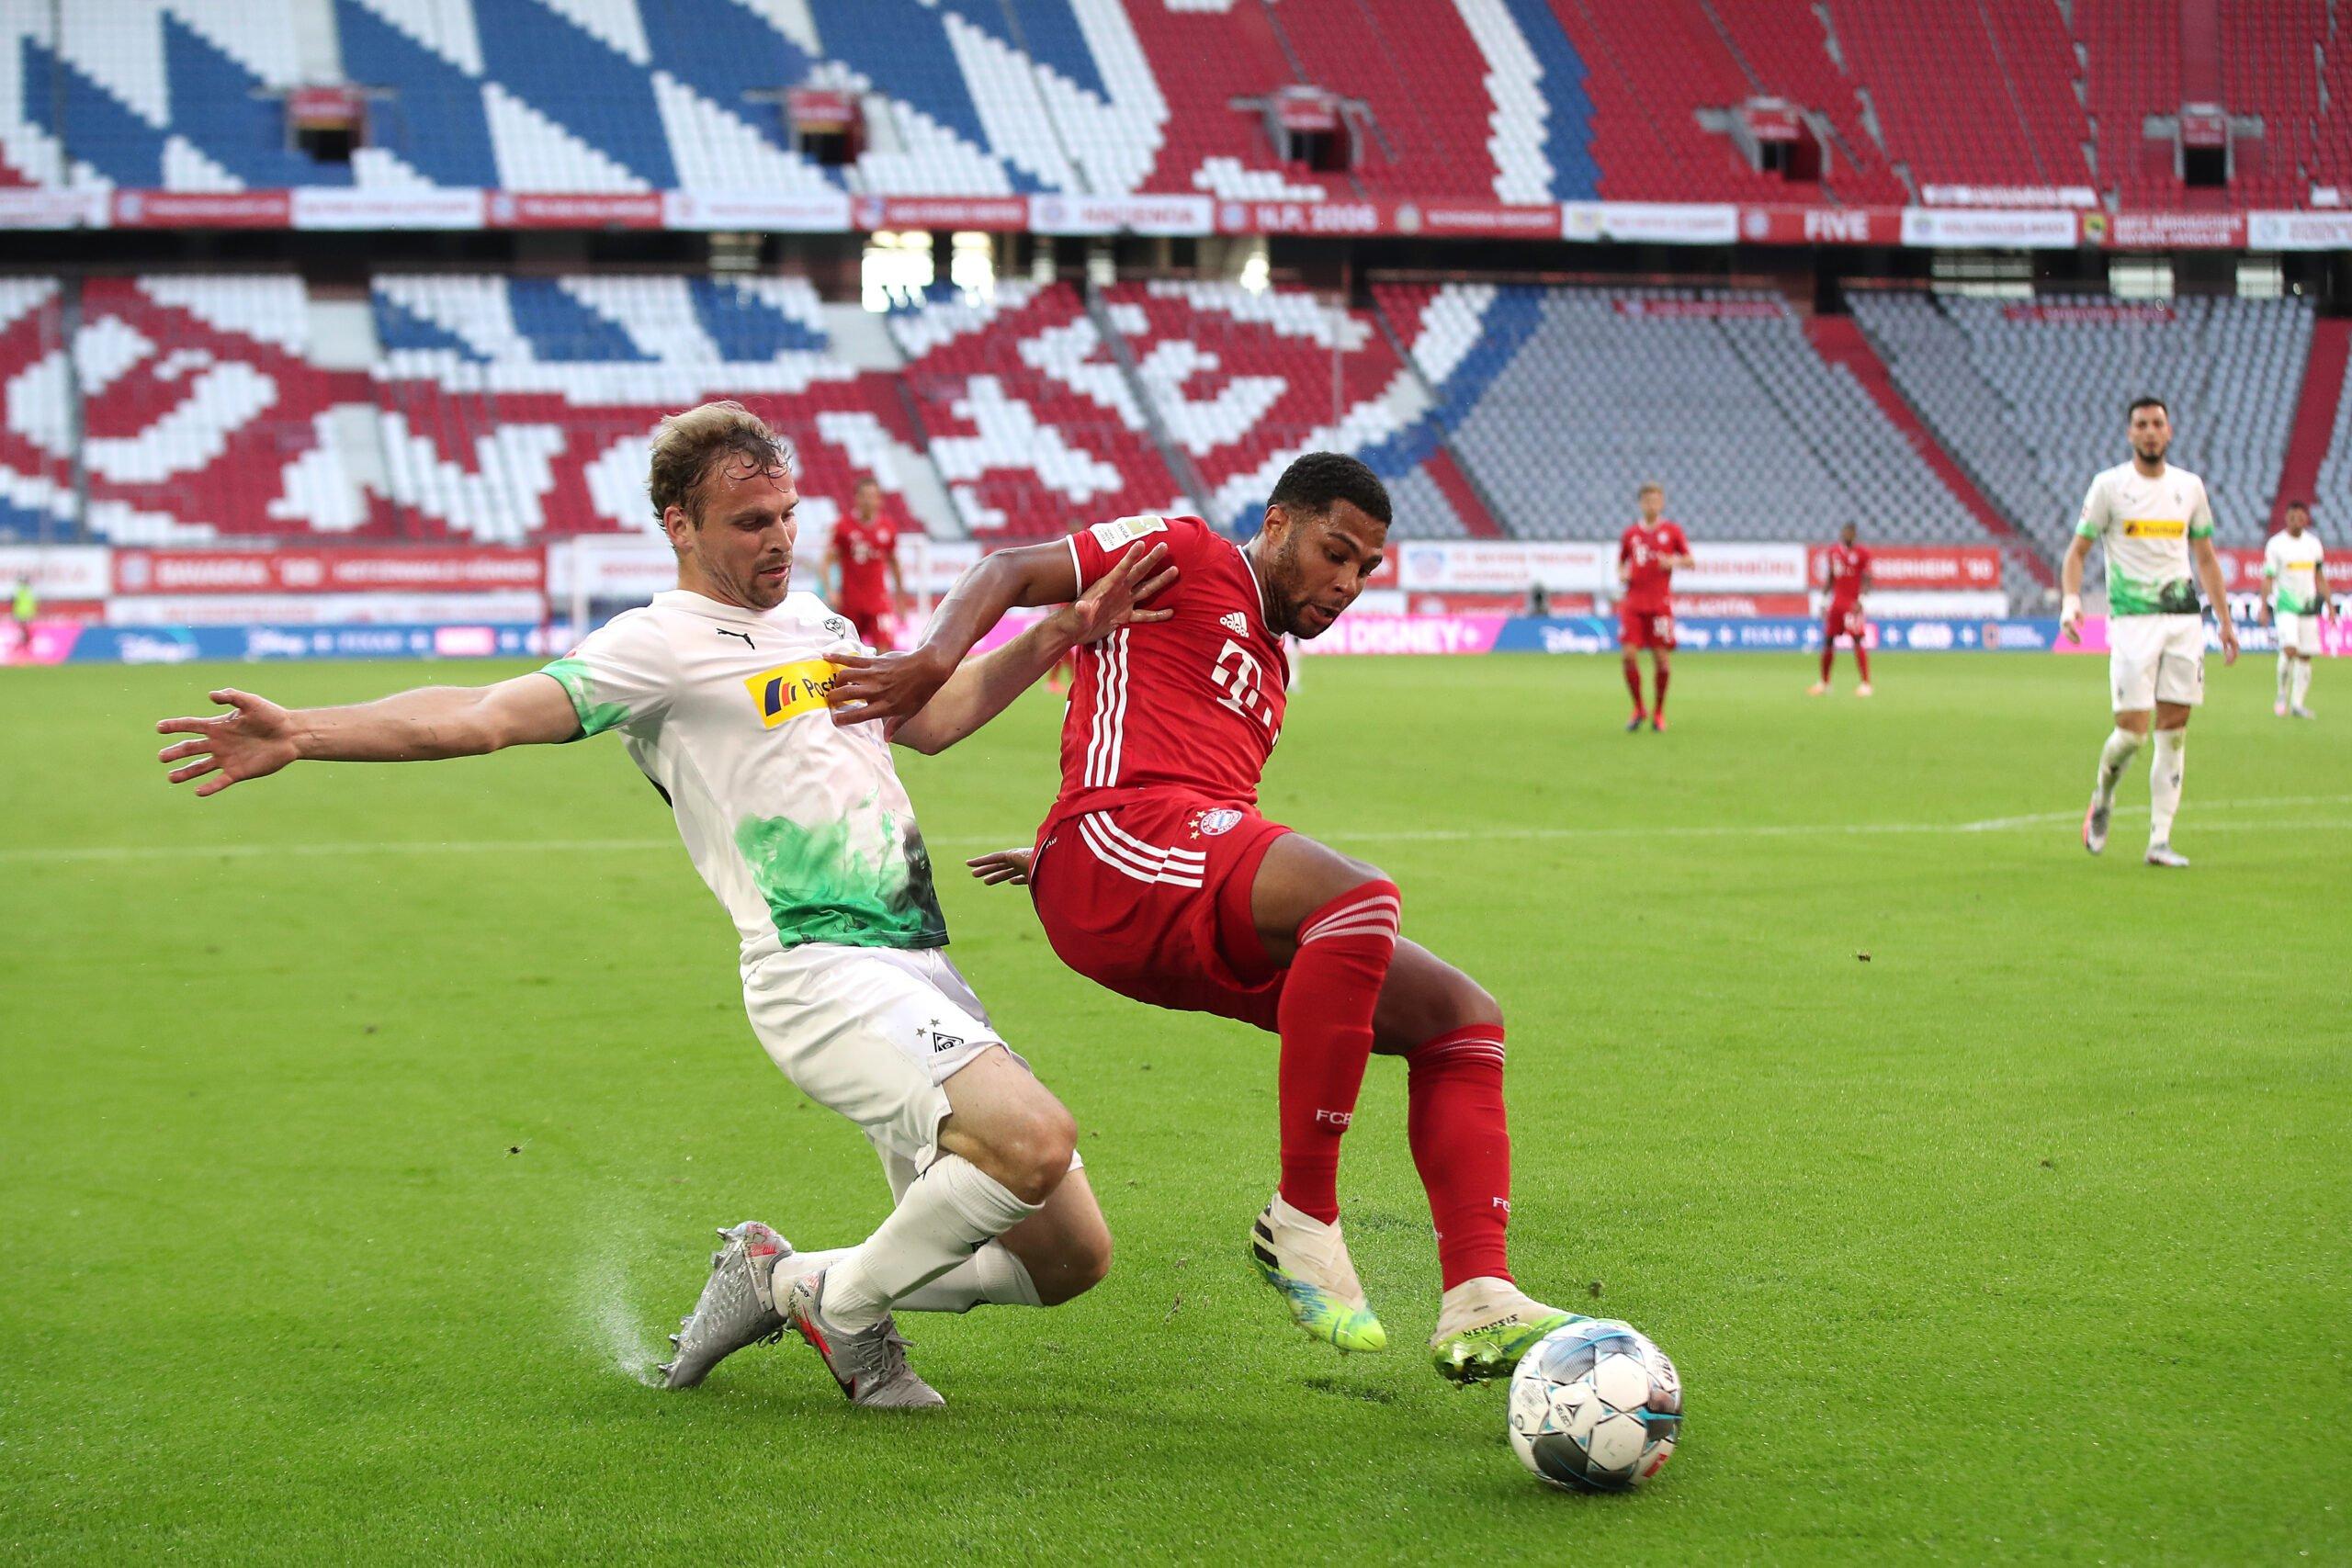 Bayern vs. Gladbach